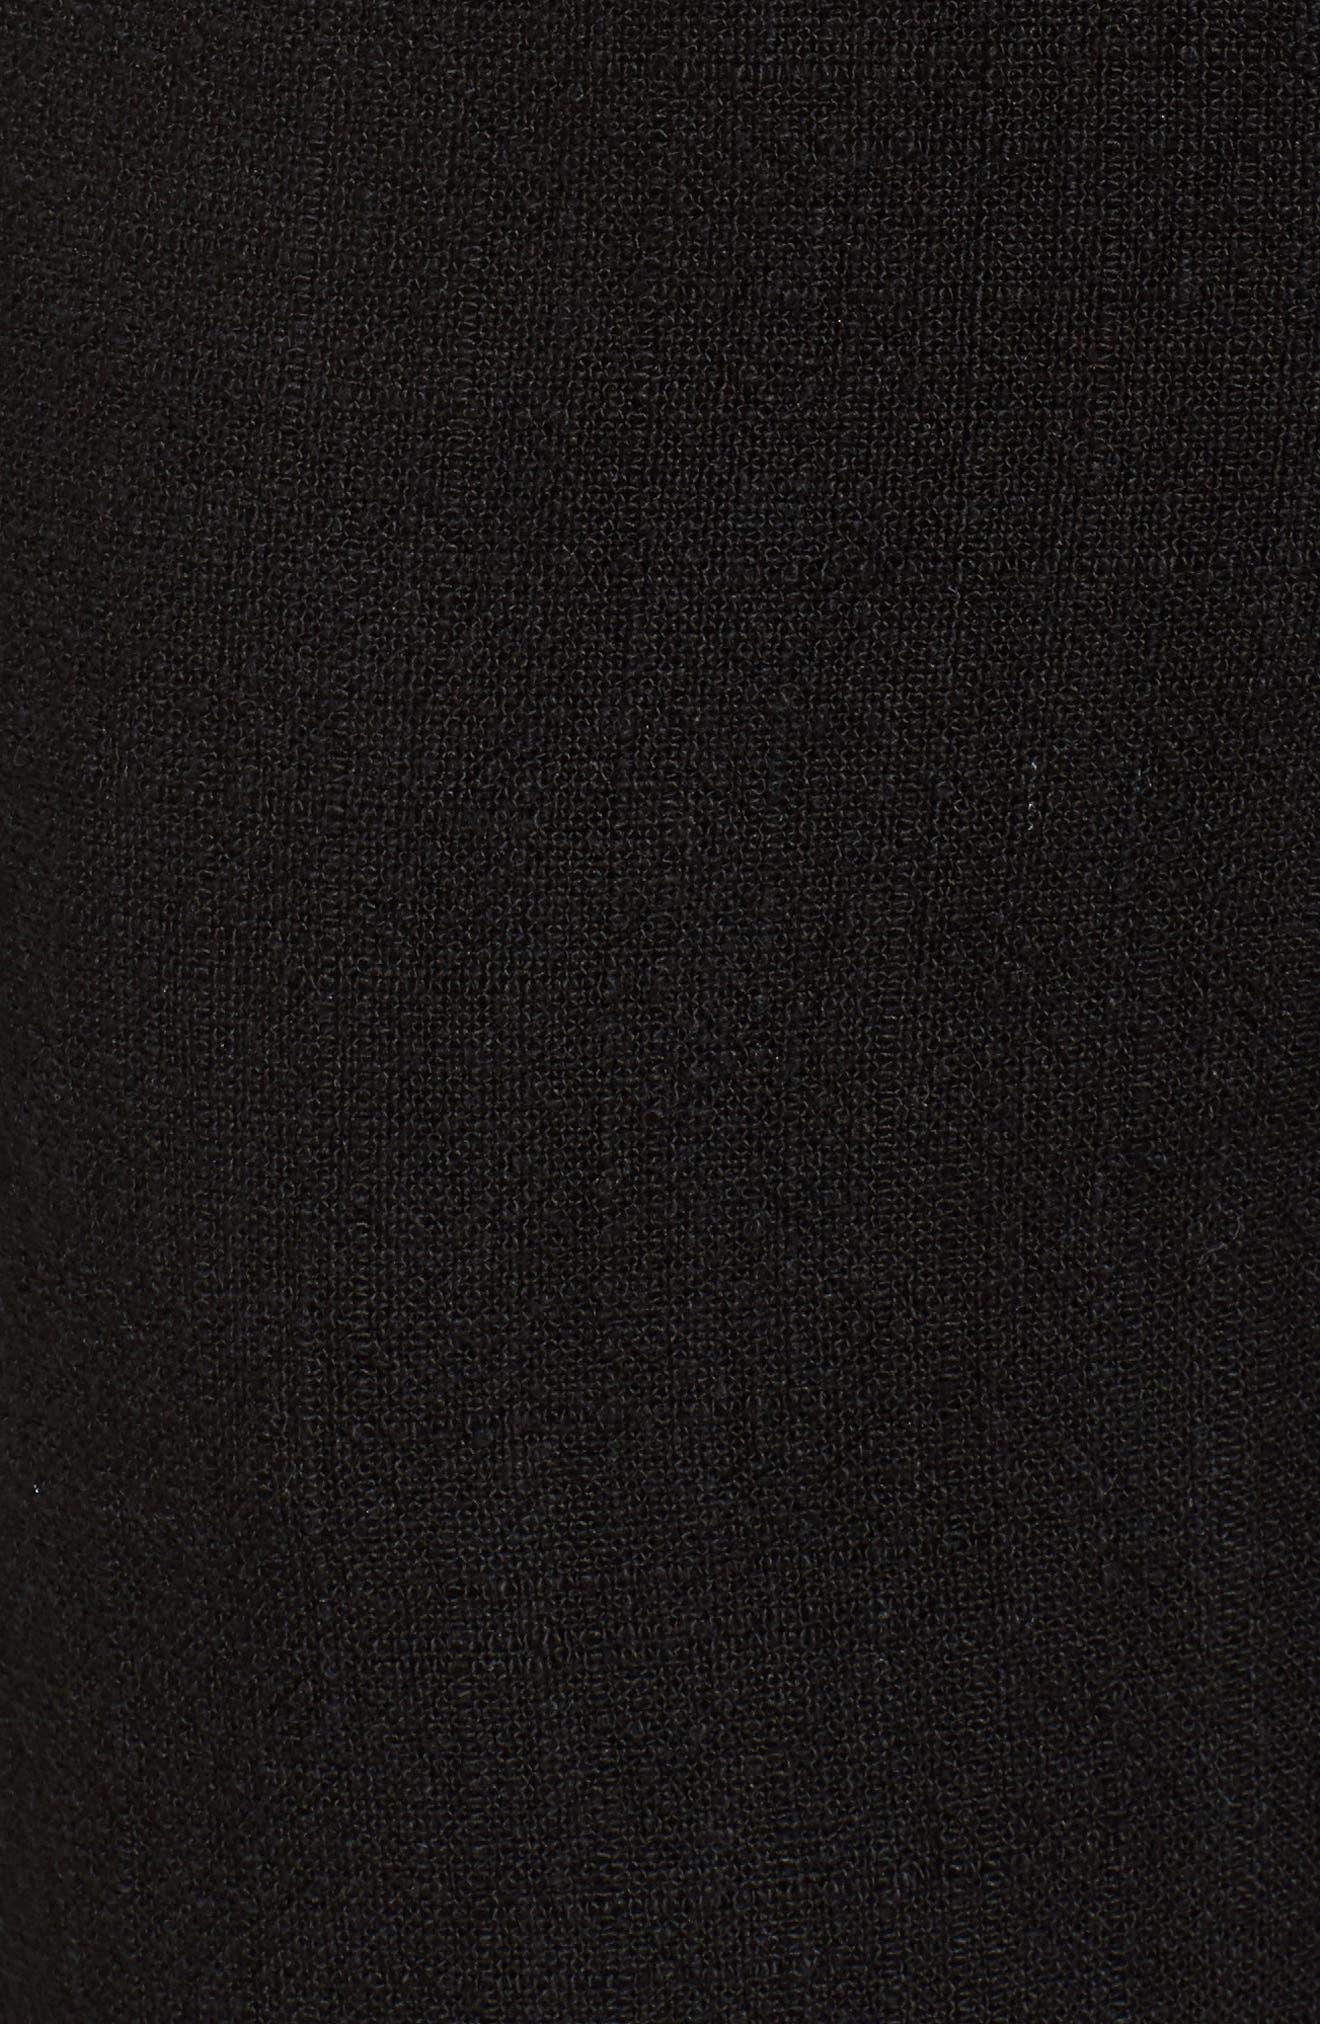 Fringe Trim Wide Leg Pants,                             Alternate thumbnail 5, color,                             001